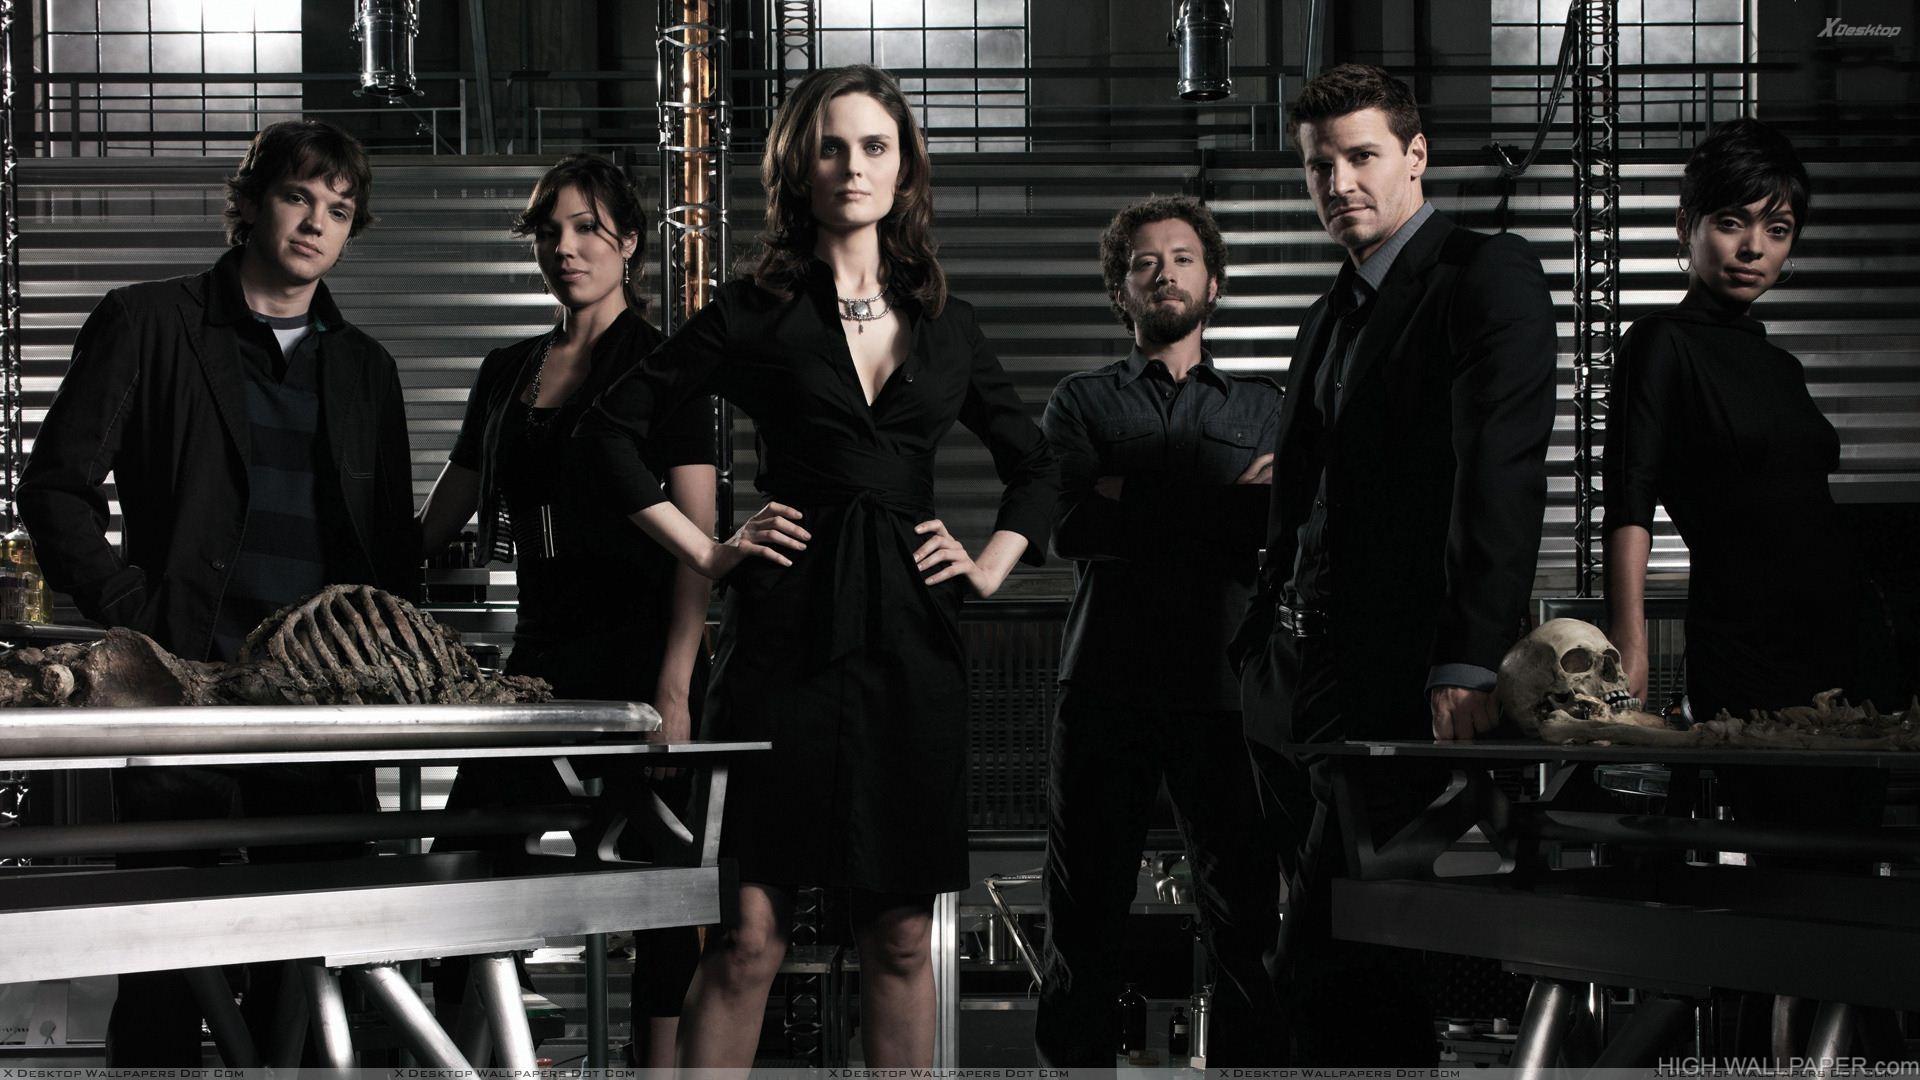 Bones Characters Wearing Black Dress